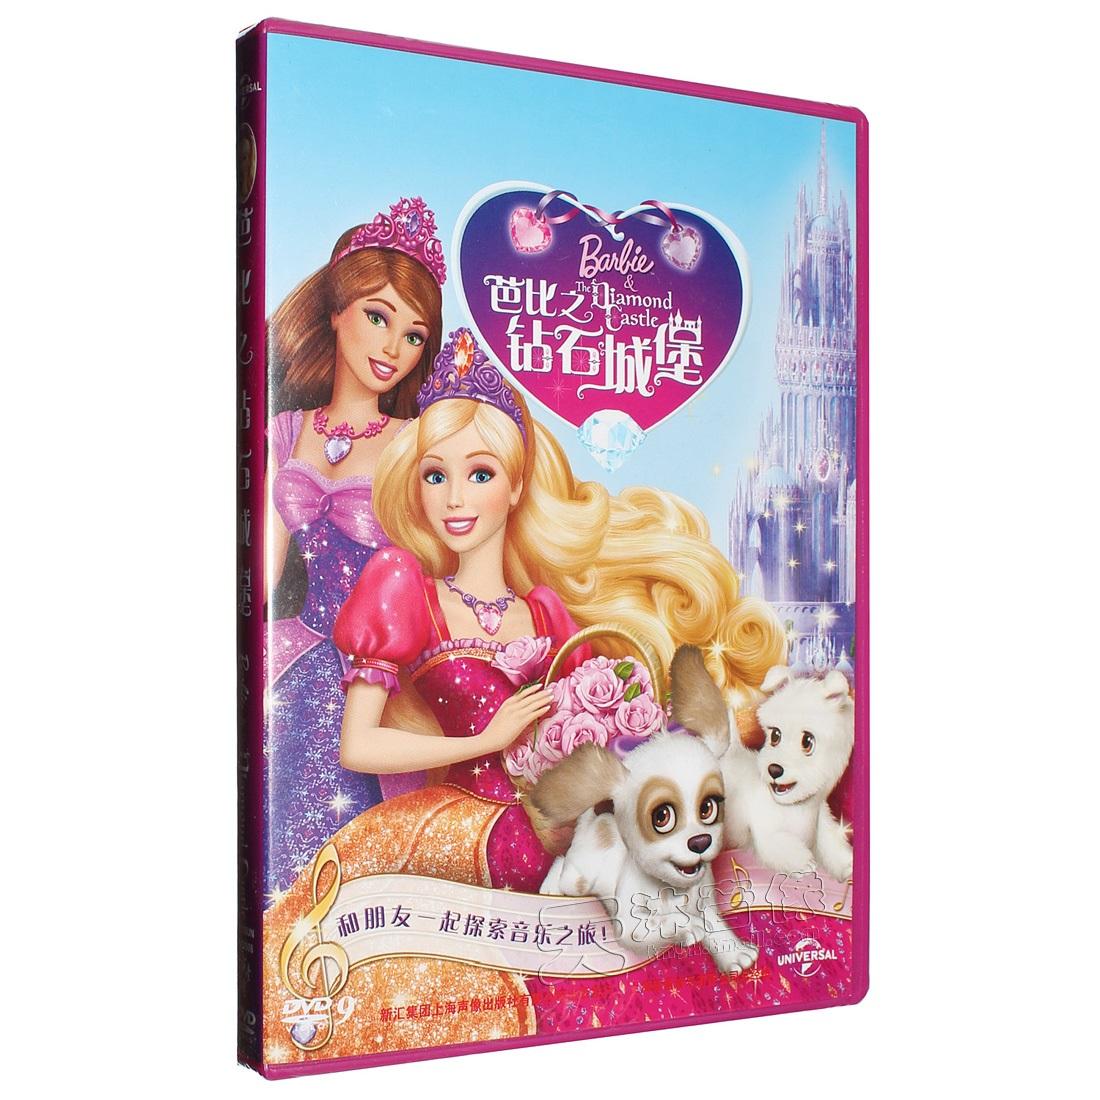 barbie芭比之仙子的秘密 dvd盒装d9 芭比系列动画片光盘dvd碟片图片